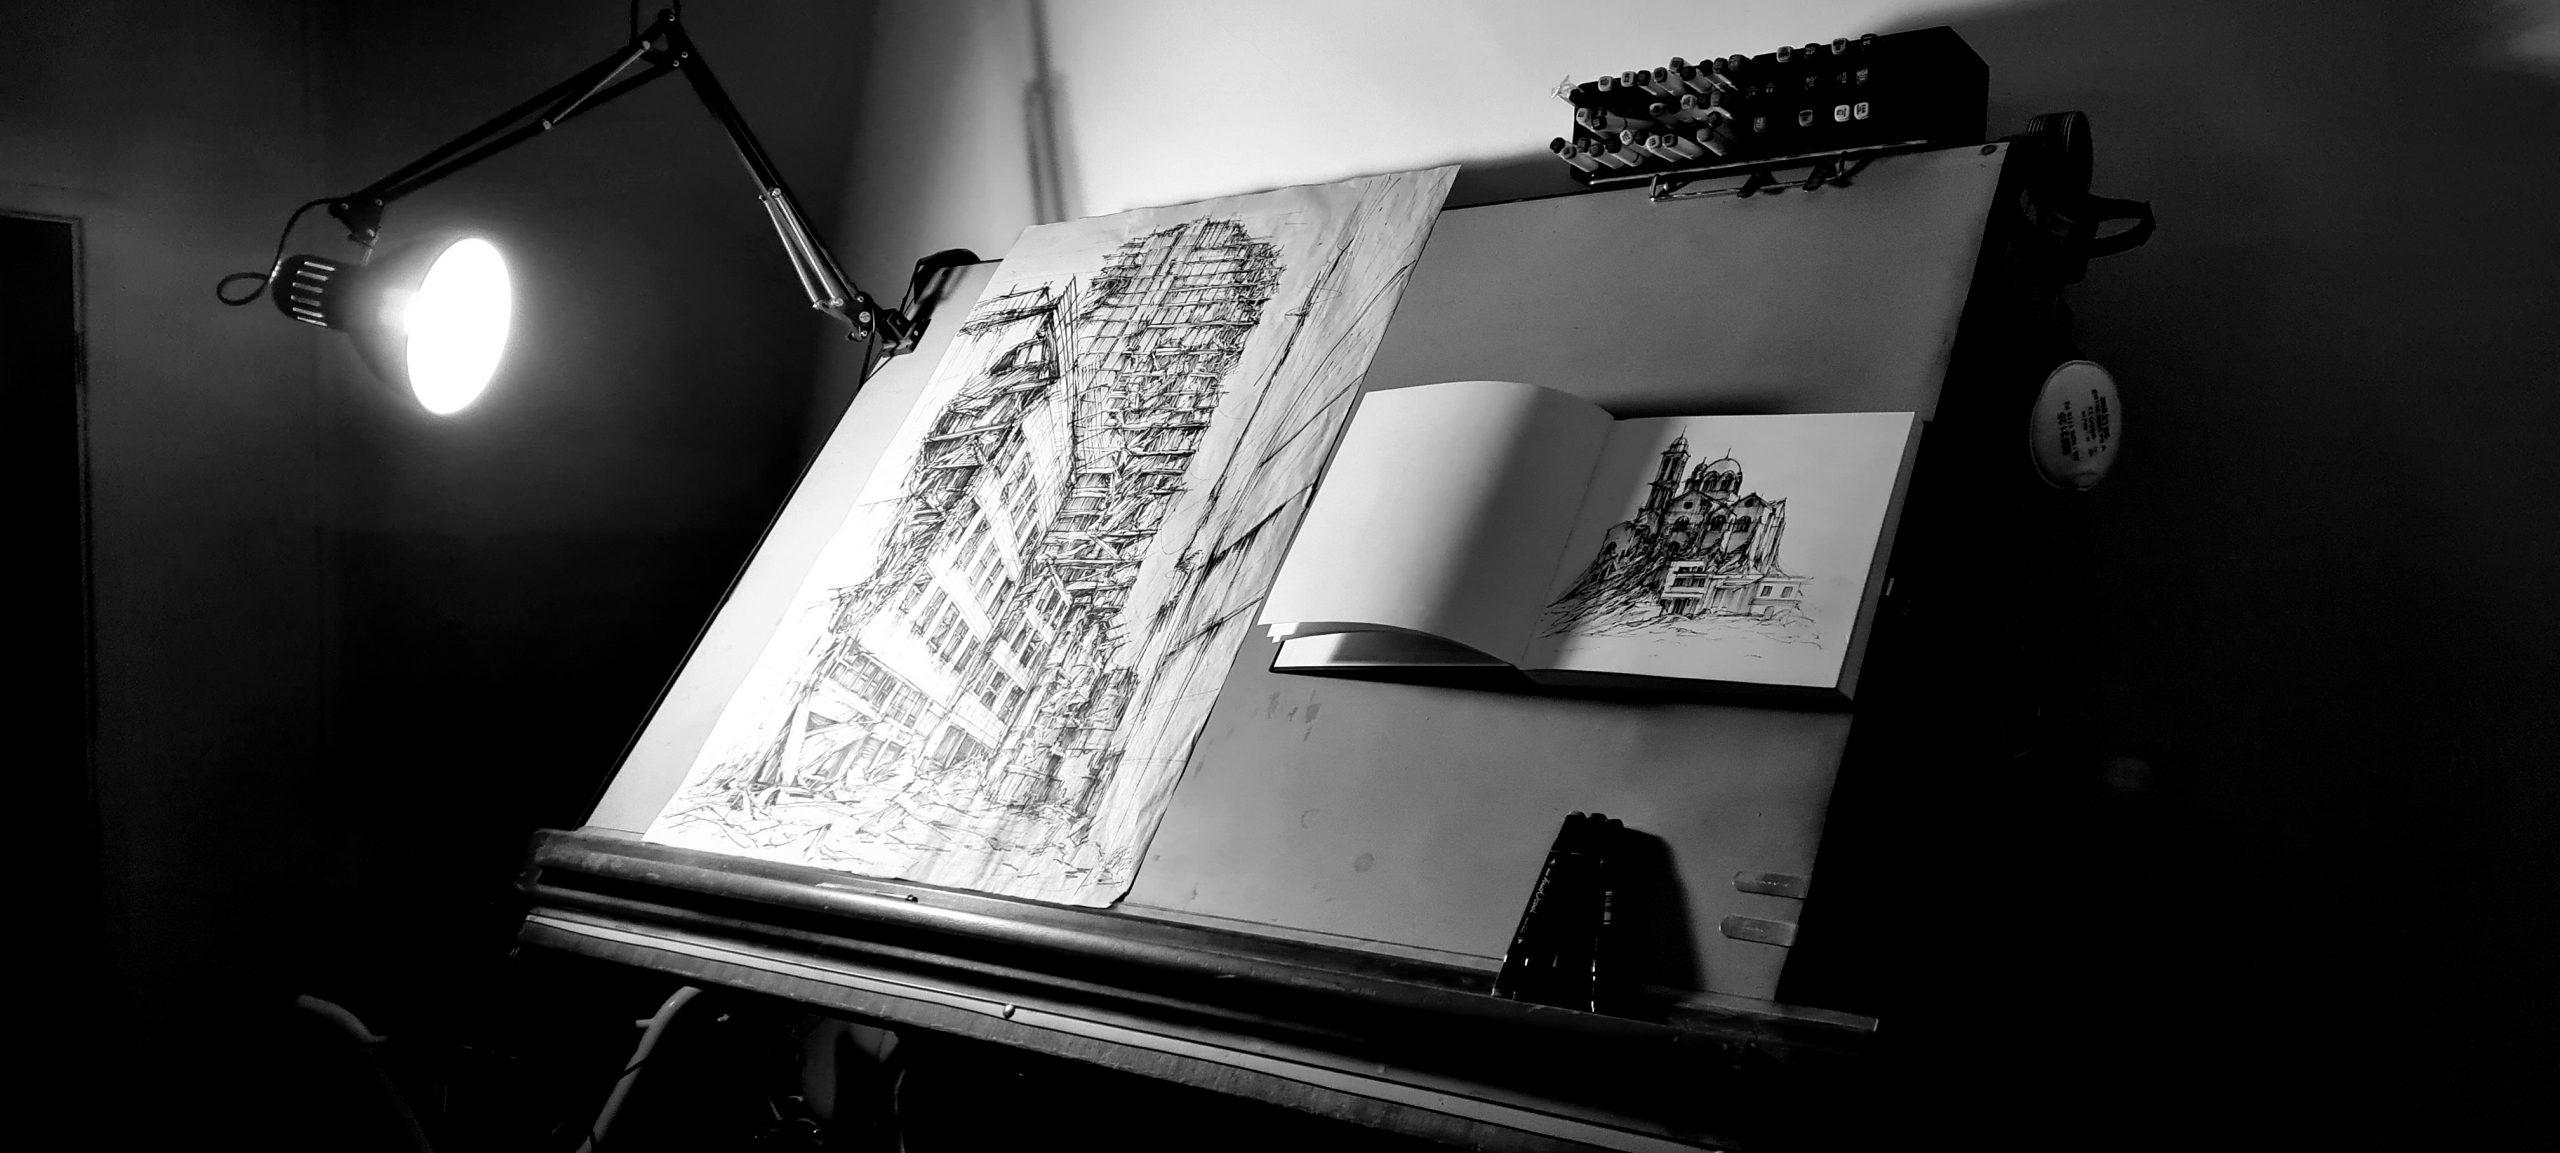 james chadderton studio imagejames chadderton studio image